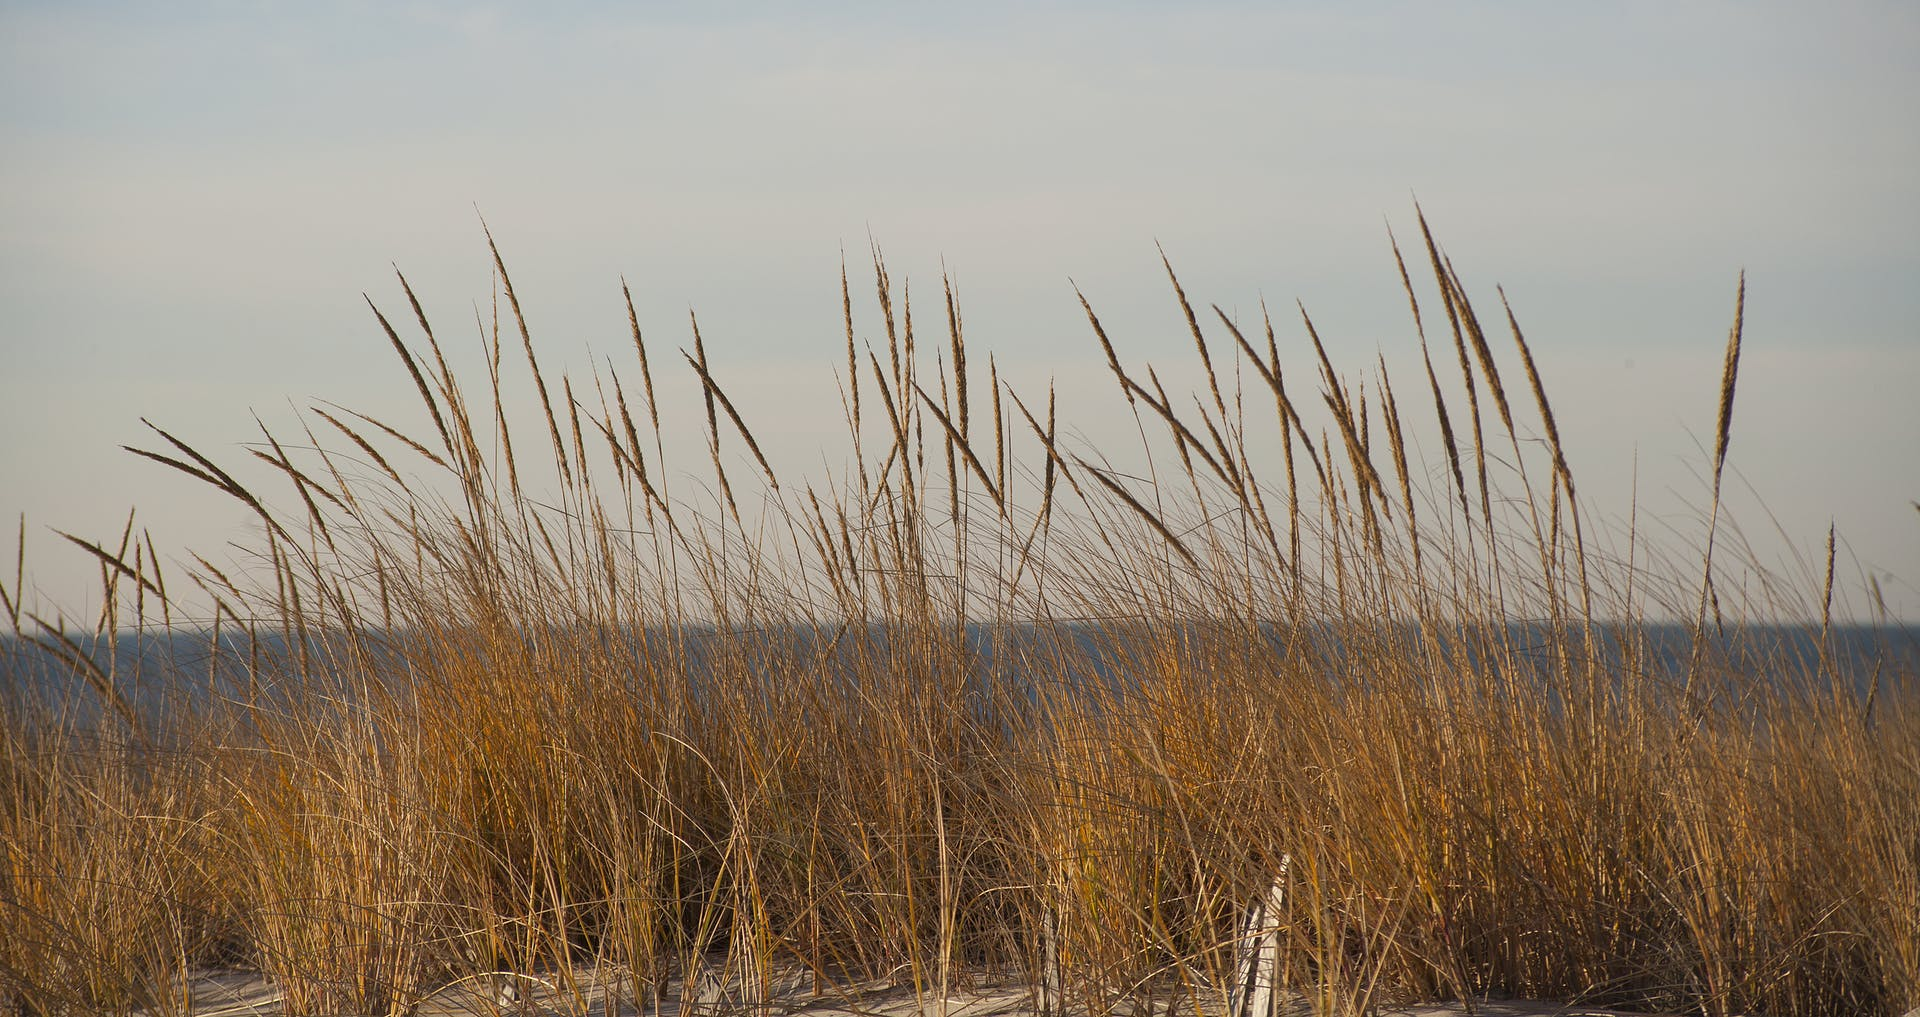 beach grass ocean atlantic ocean outdoorchallenge beach